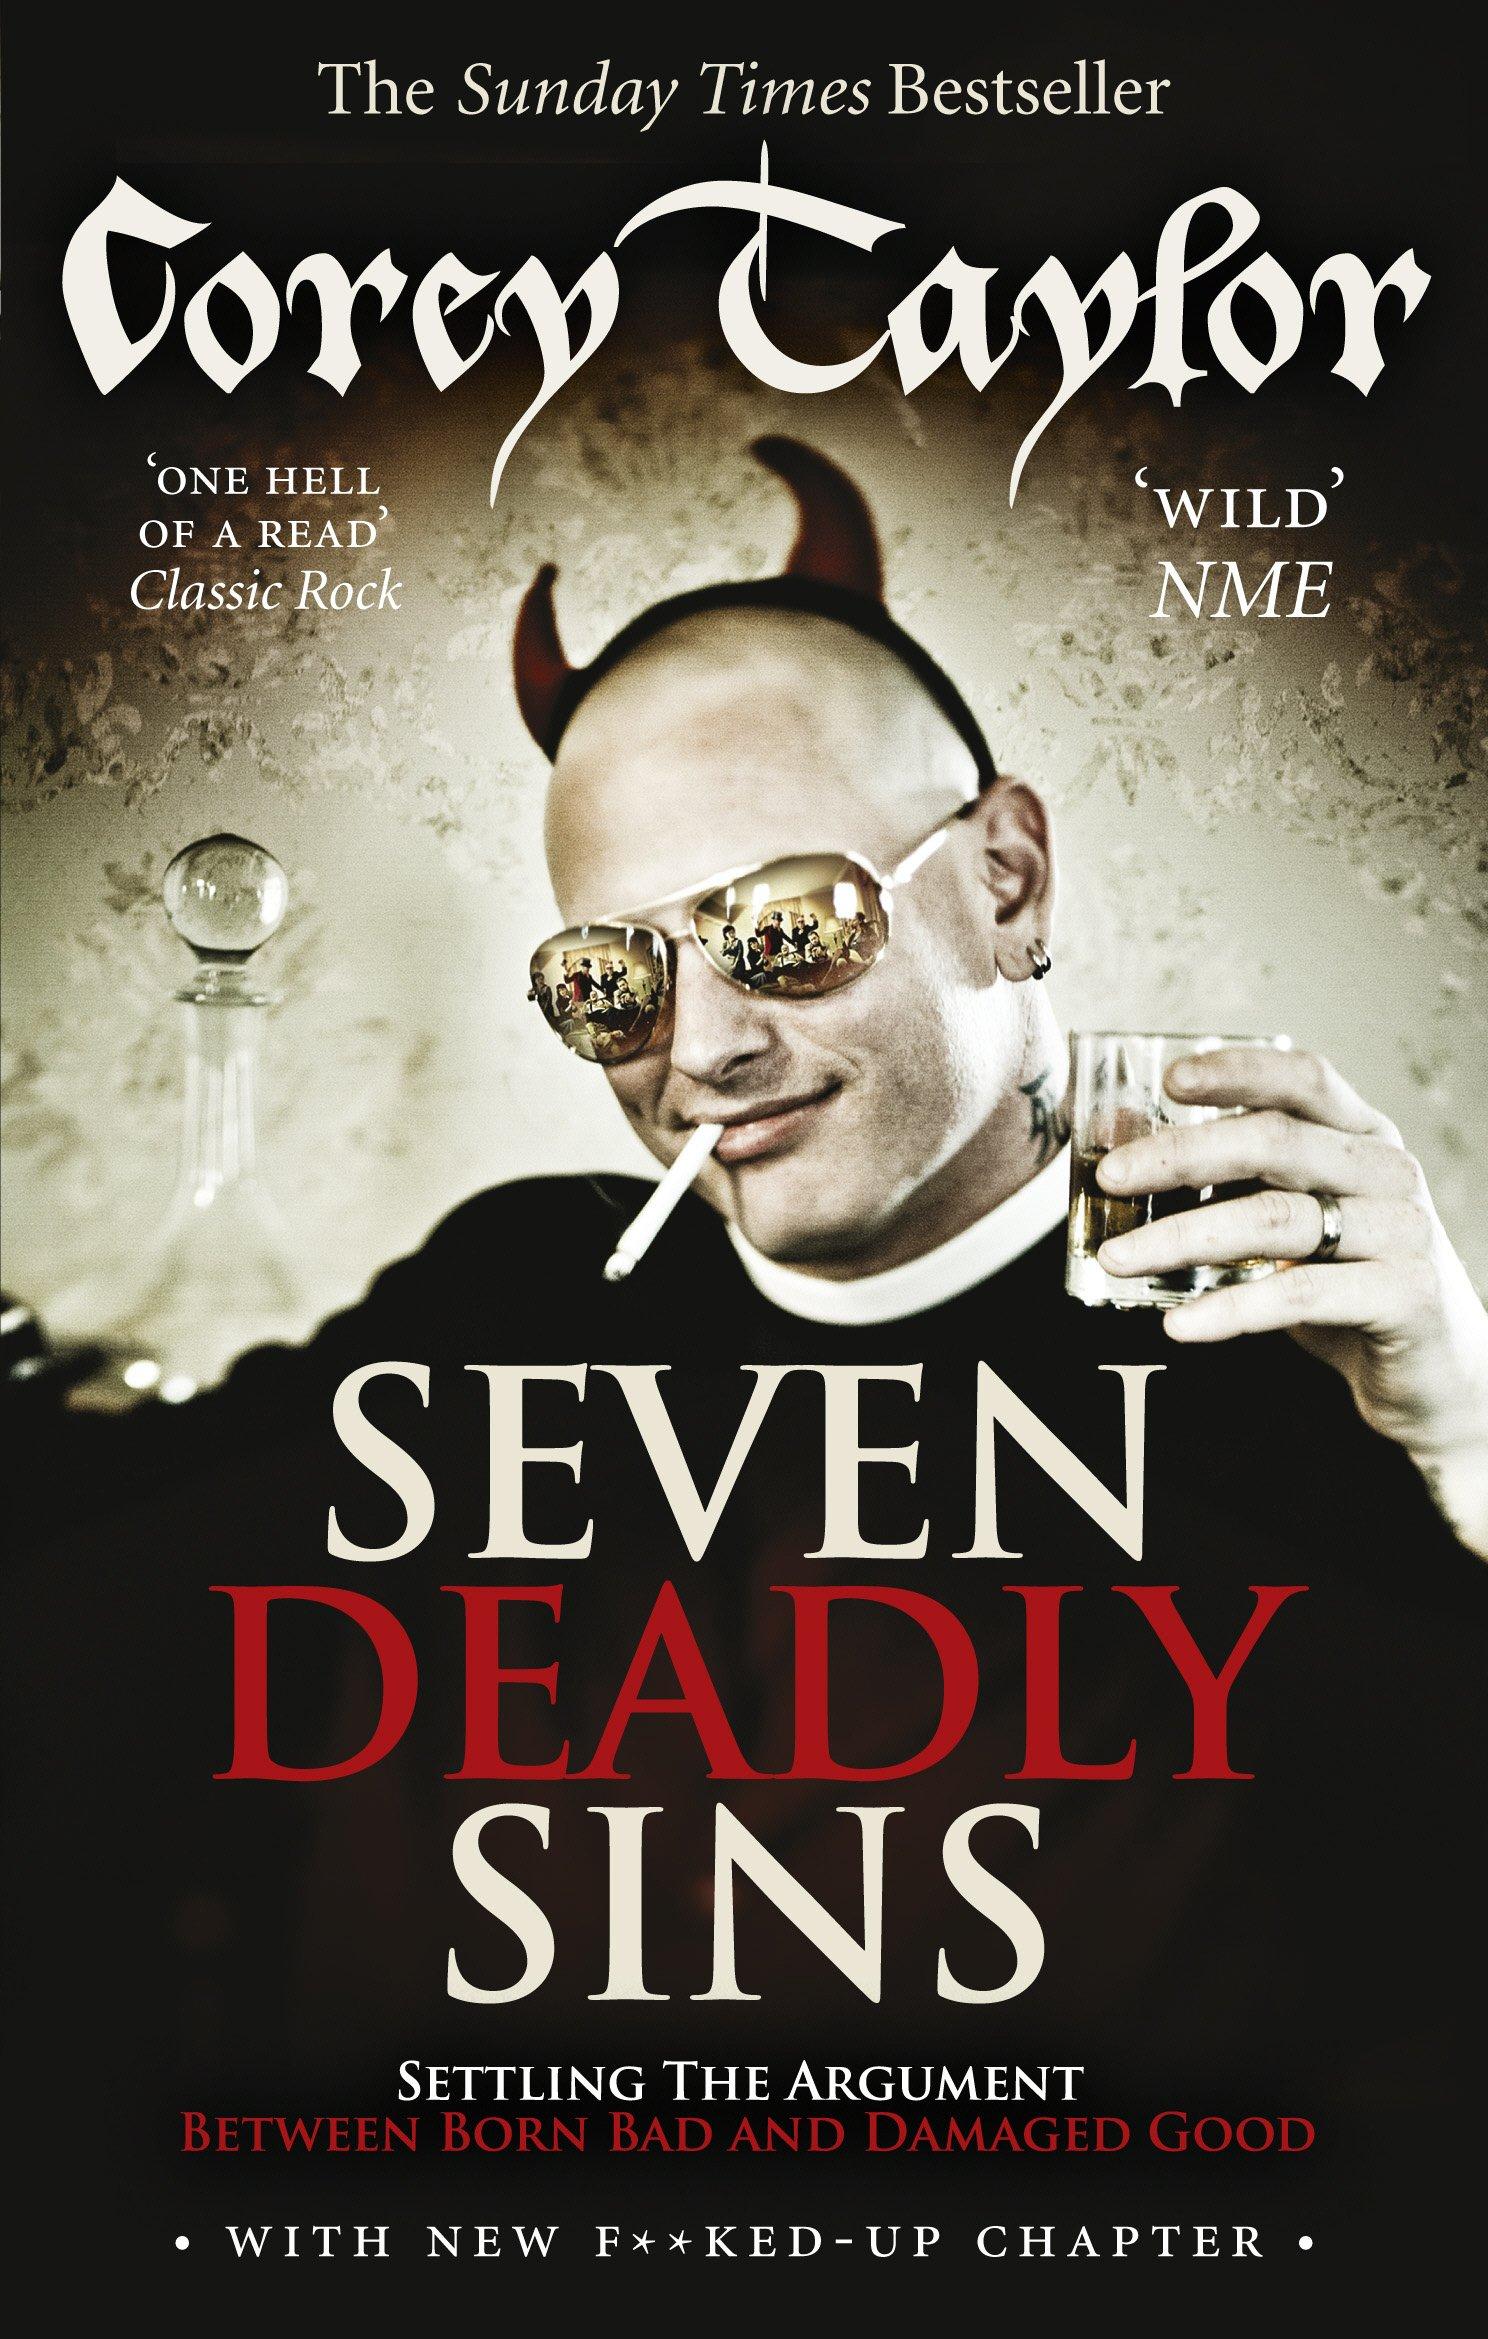 Seven Deadly Sins: Amazon.co.uk: Corey Taylor: 9780091938468: Books